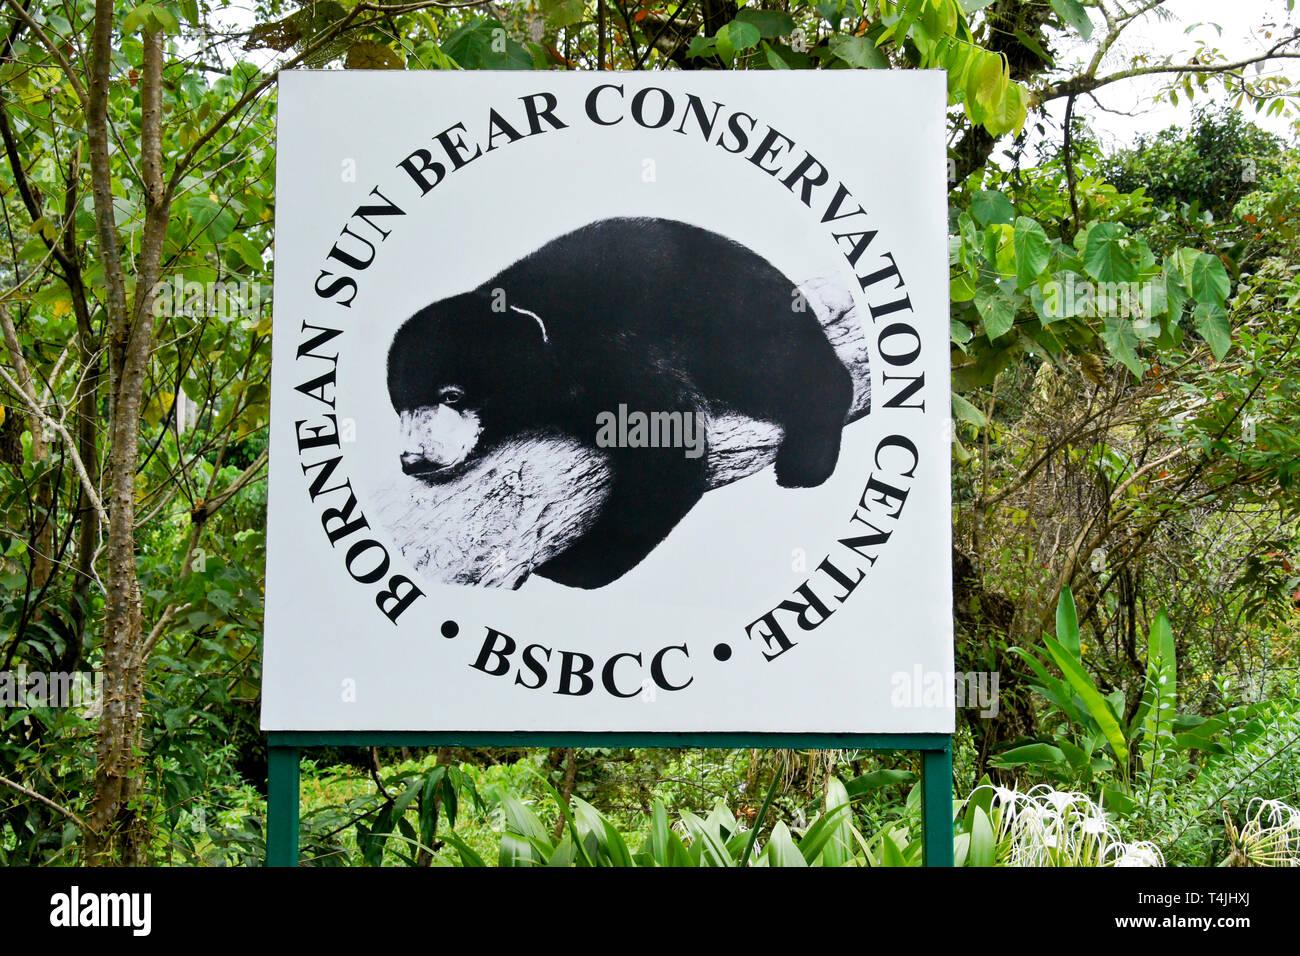 Schild am Eingang der Bornesischen Sun Bear Conservation Centre, Sandakan, Sabah (Borneo), Malaysia Stockfoto